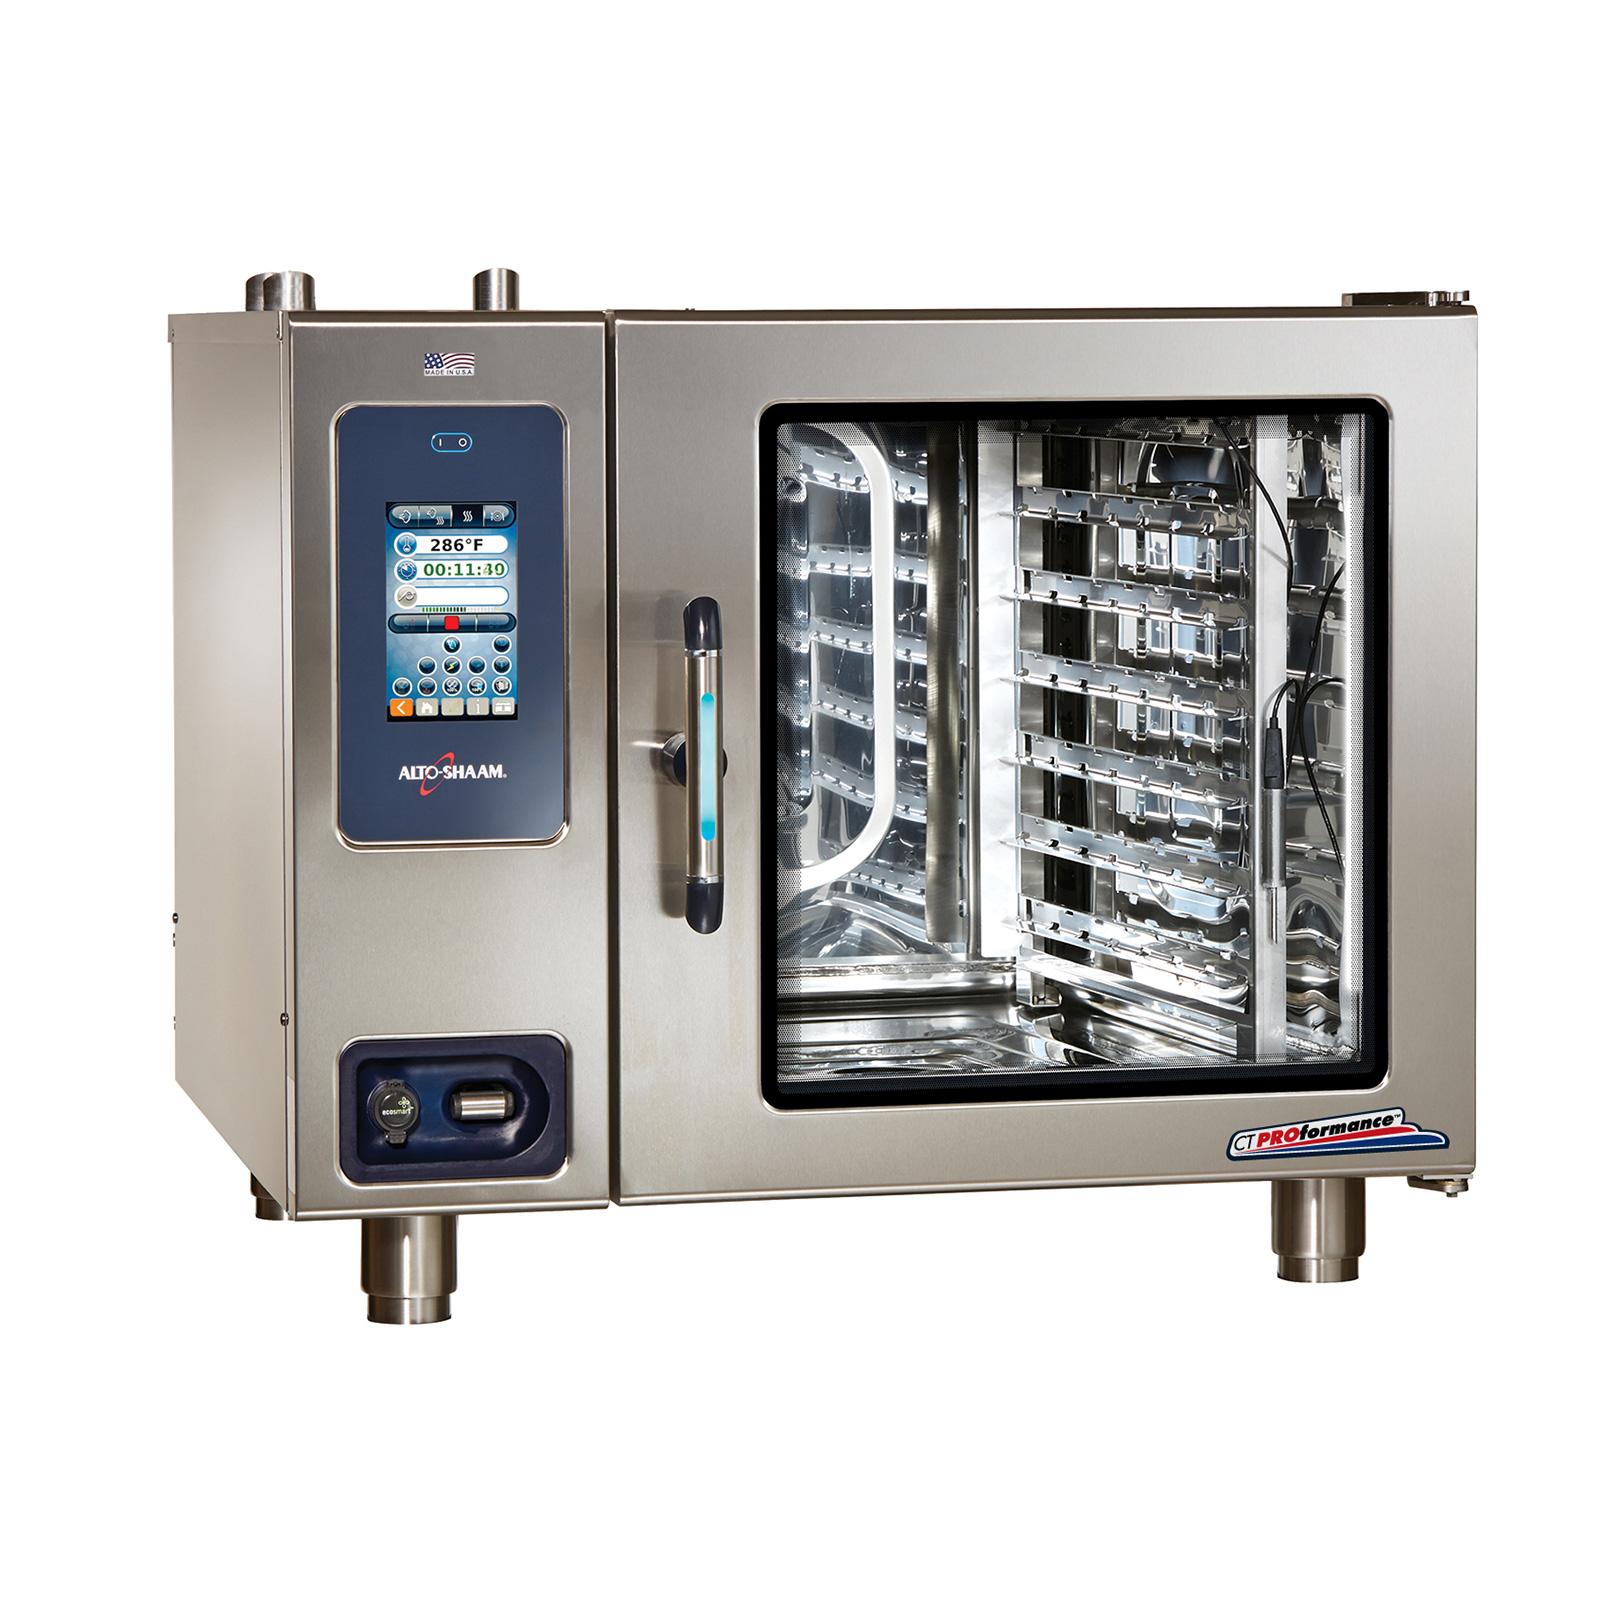 Alto-Shaam CTP7-20G combi oven, gas